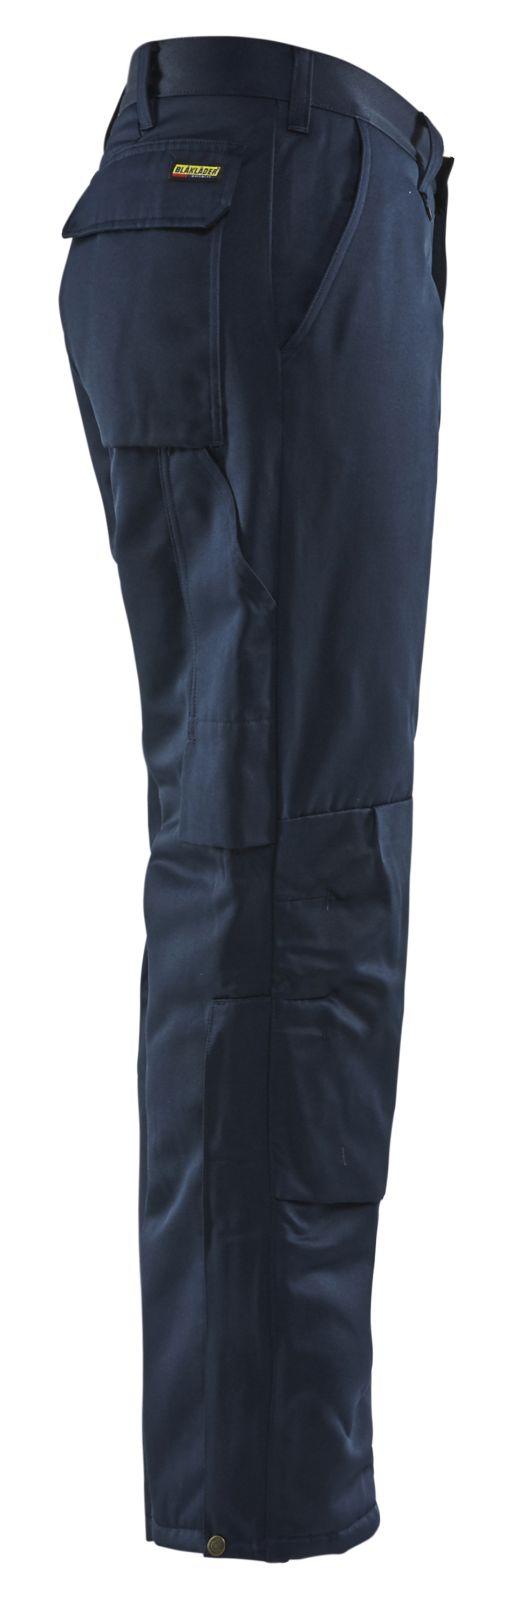 Blaklader Winterbroeken 18001900 marineblauw(8800)